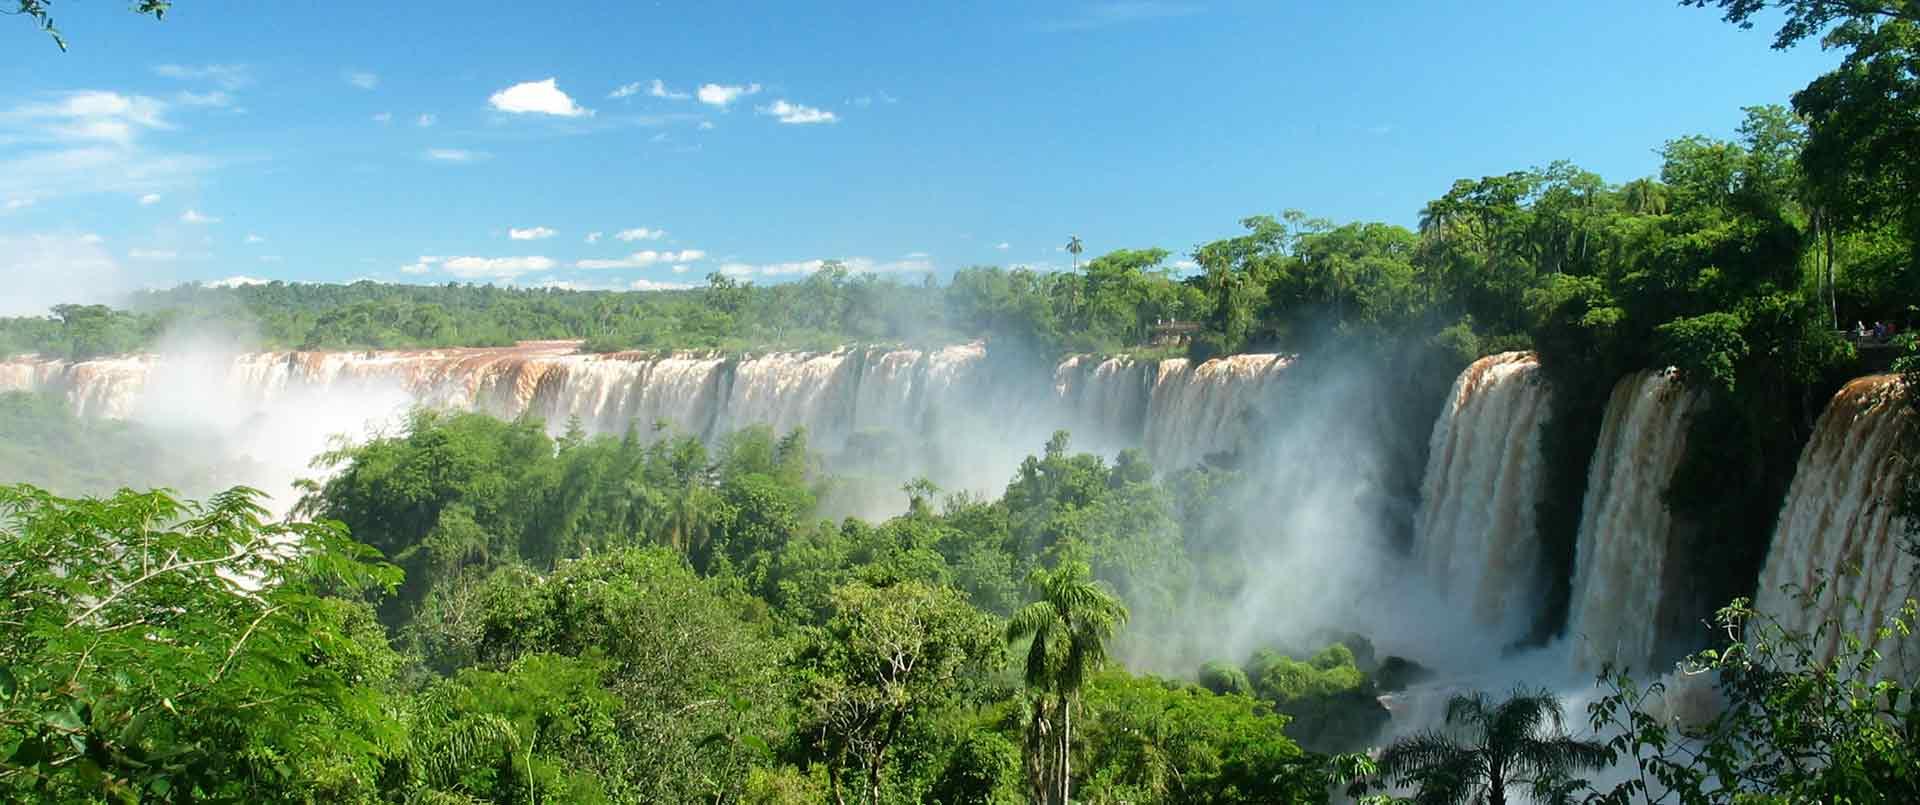 The Jungles, Wetlands & Waterfalls of Brazil